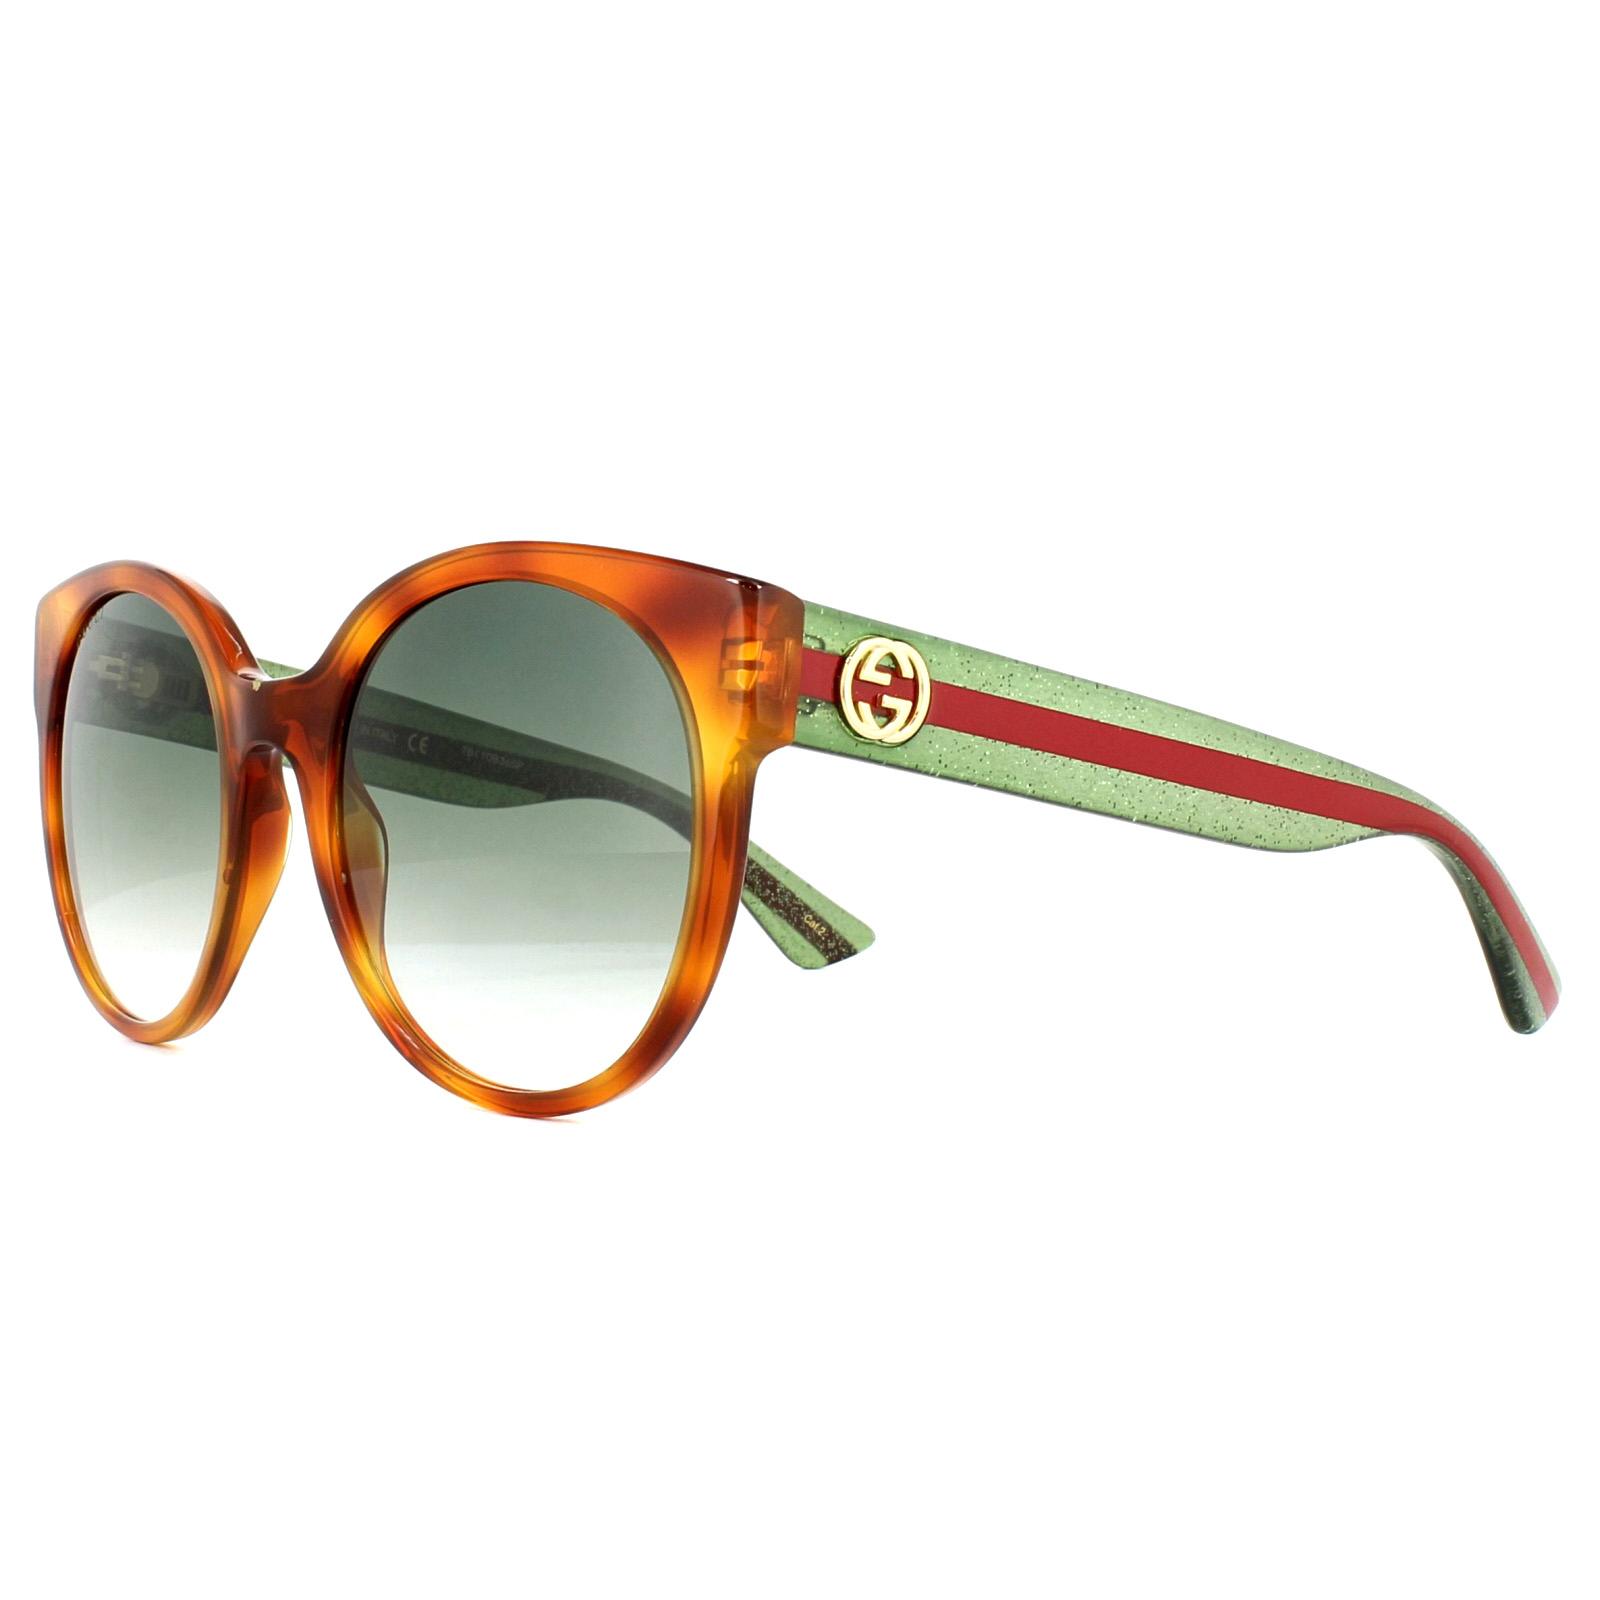 8d7ed6f6306 Sentinel Gucci Sunglasses GG0035S 003 Tortoise Green Red Green Gradient